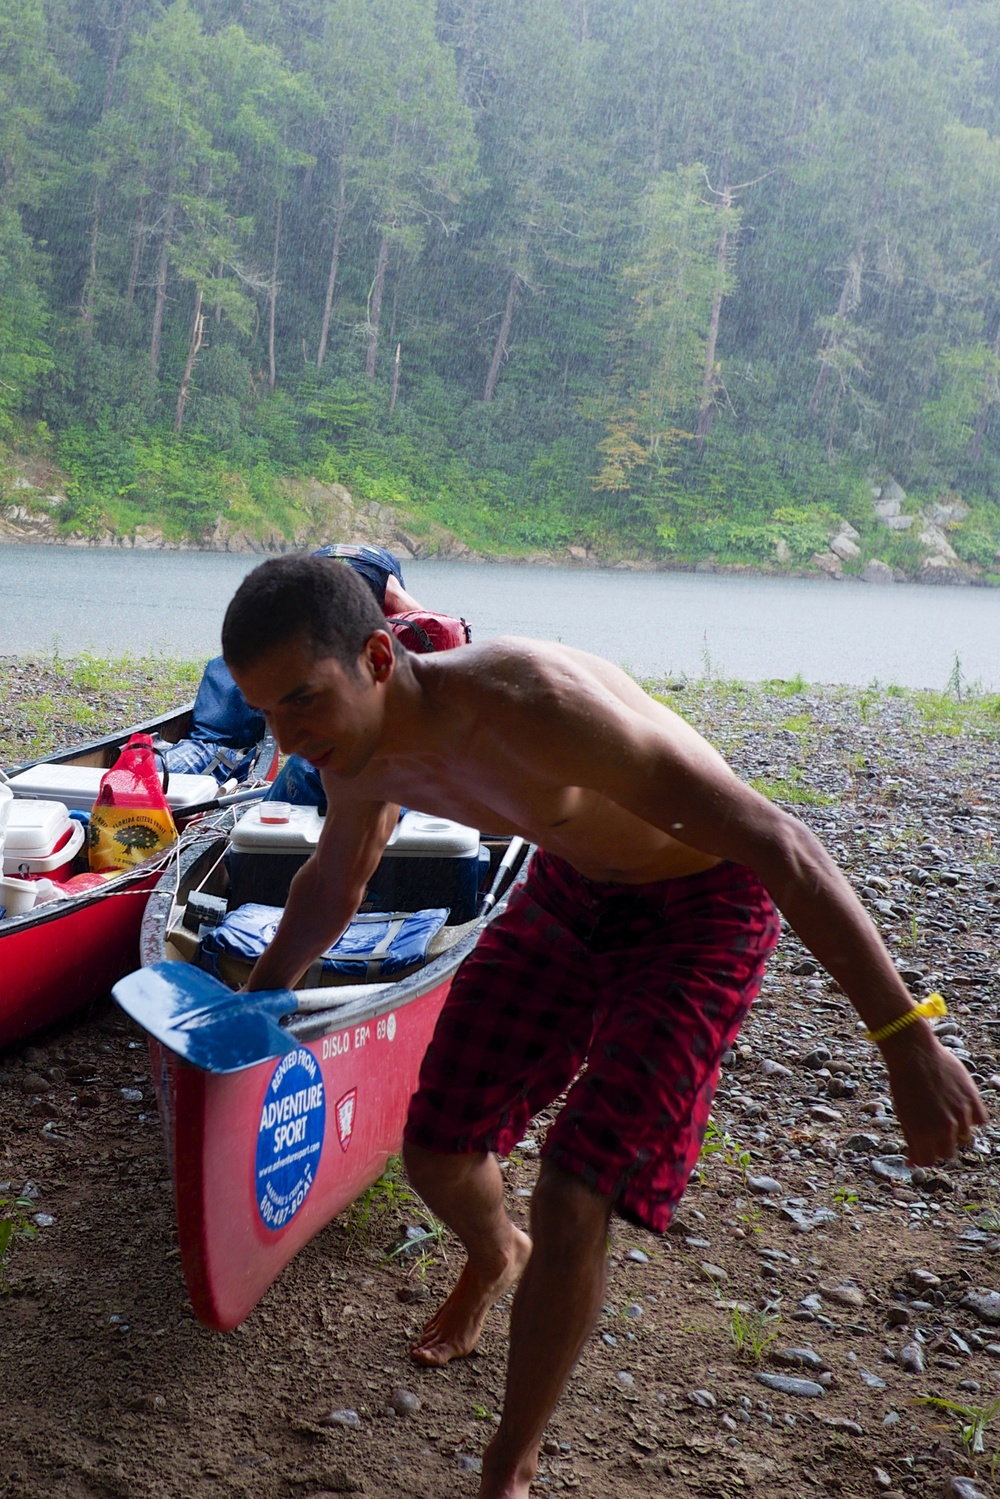 Angel Rodriguez Canoeing in the Rain